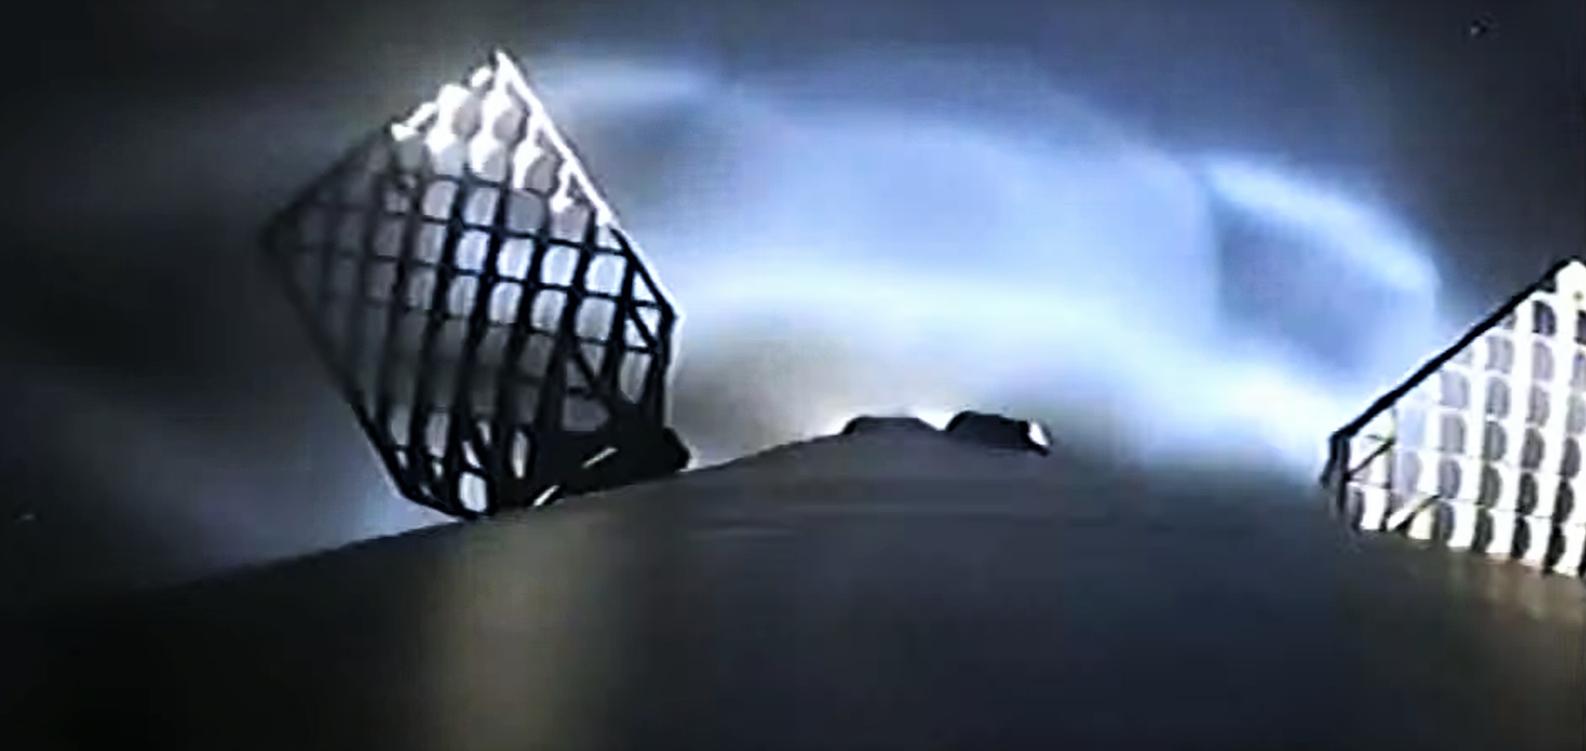 Starlink V1 L8 Falcon 9 B1059 061320 (SpaceX) launch 2